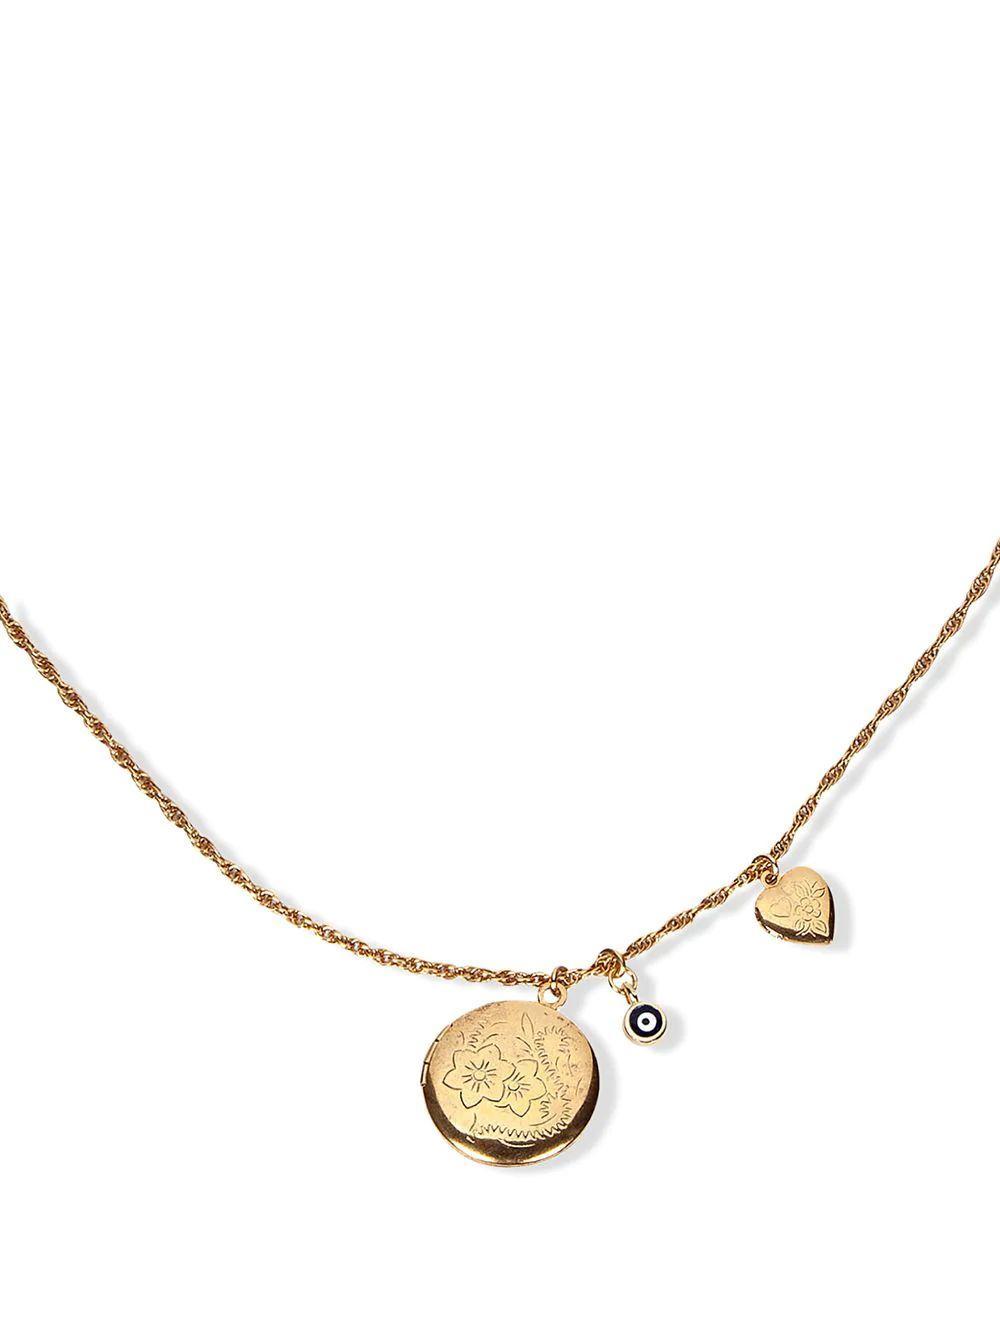 Mila Charm Necklace Item # 111PA18